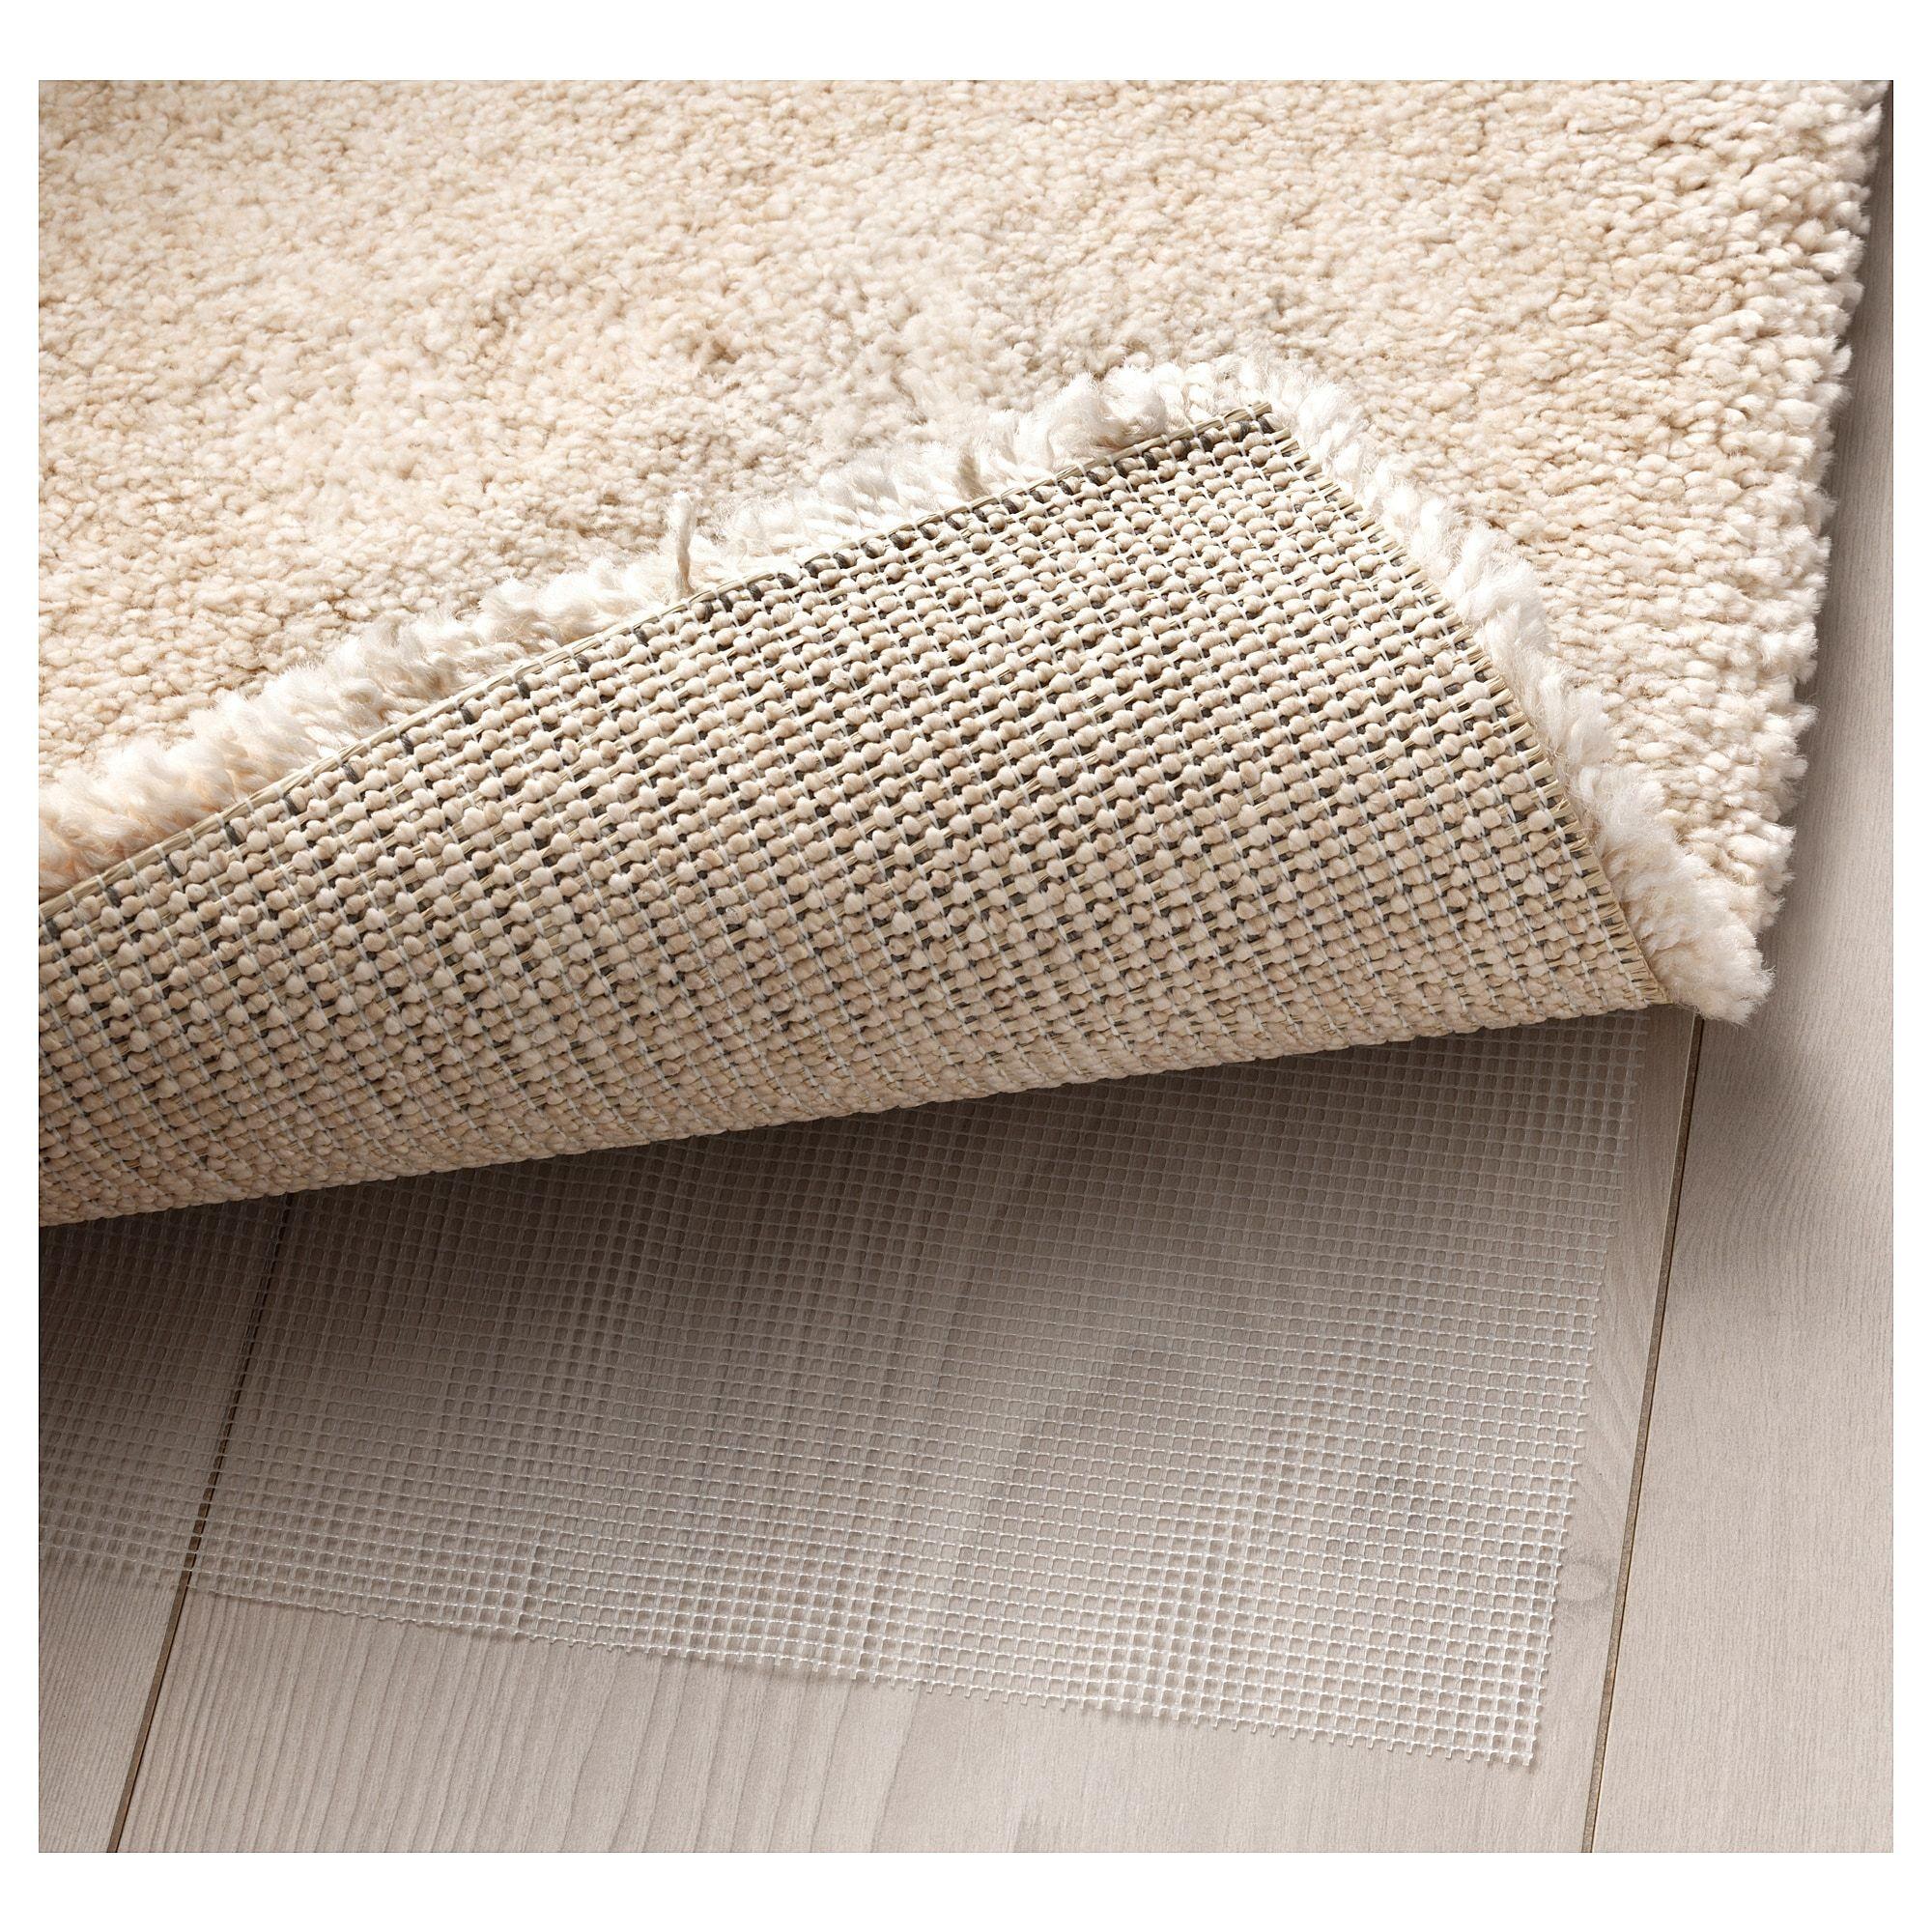 Ikea Stoense Off White Rug Low Pile Grey Carpet Rugs